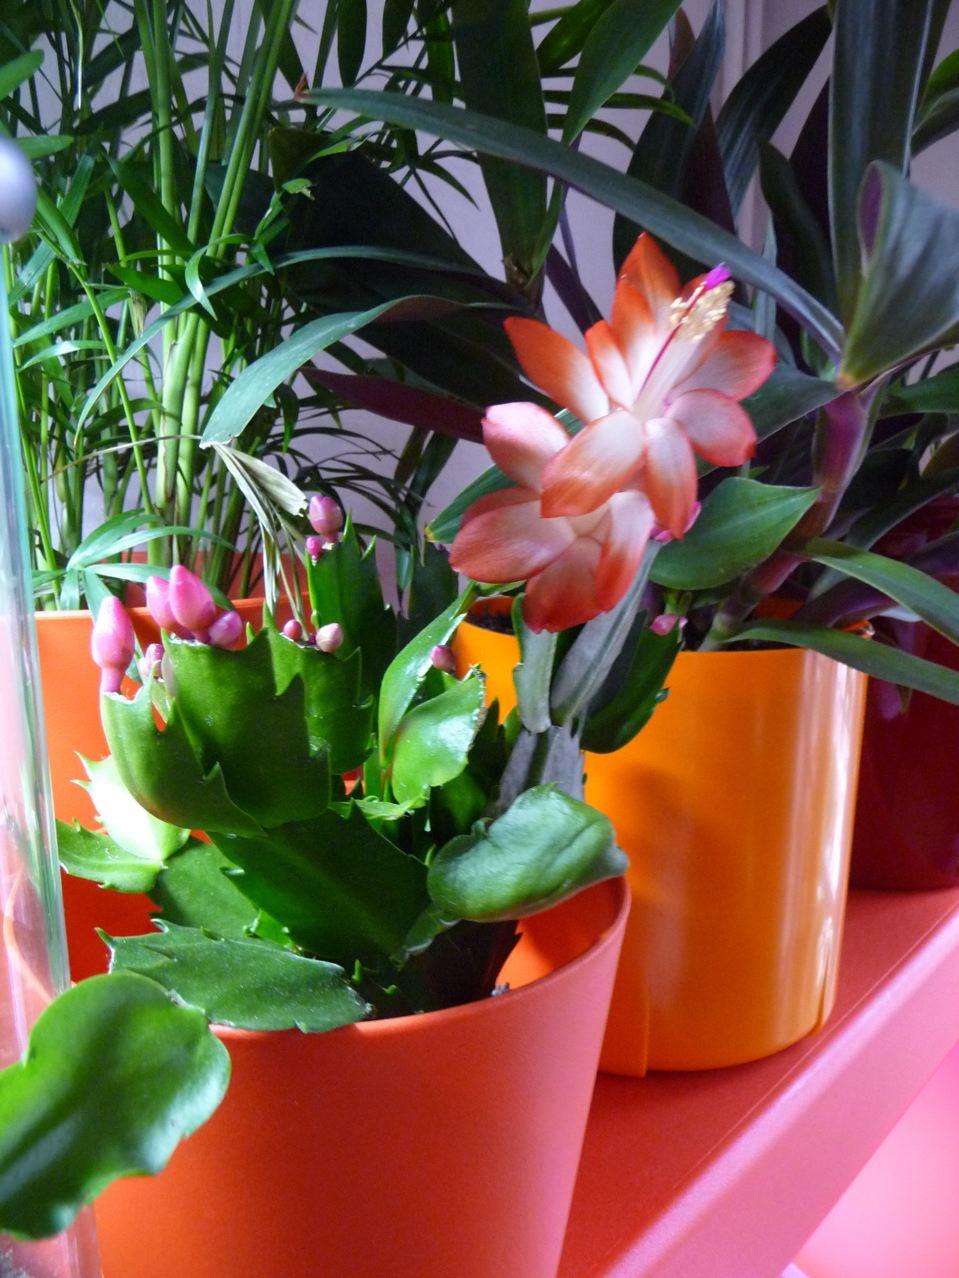 Schlumbergera hybride à fleurs ivoire et orange